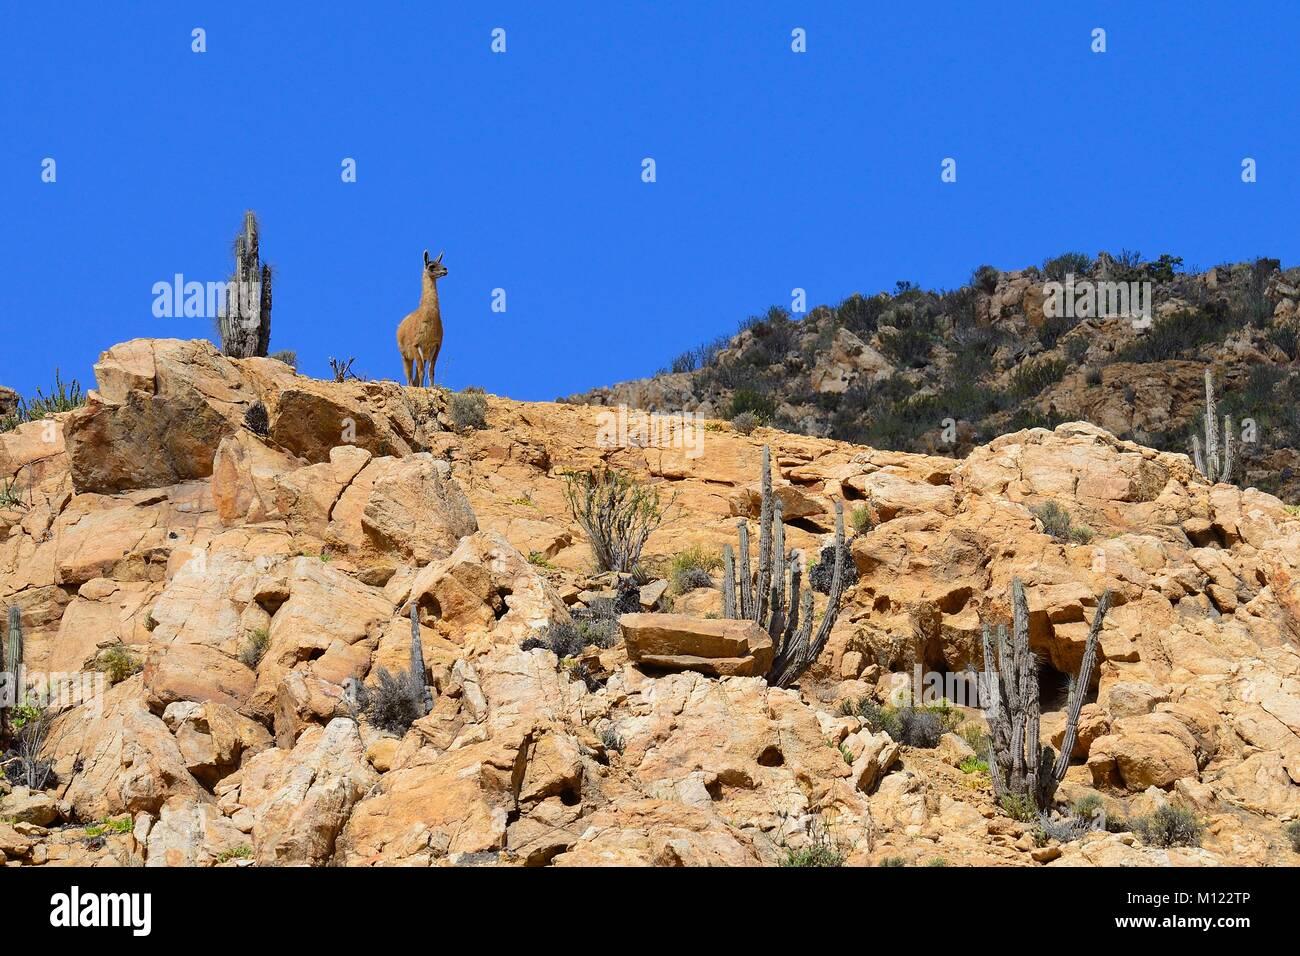 Guanaco (Lama guanicoe) on a hill,Pan de Azúcar National Park,near Chañaral,Región de Atacama,Chile - Stock Image